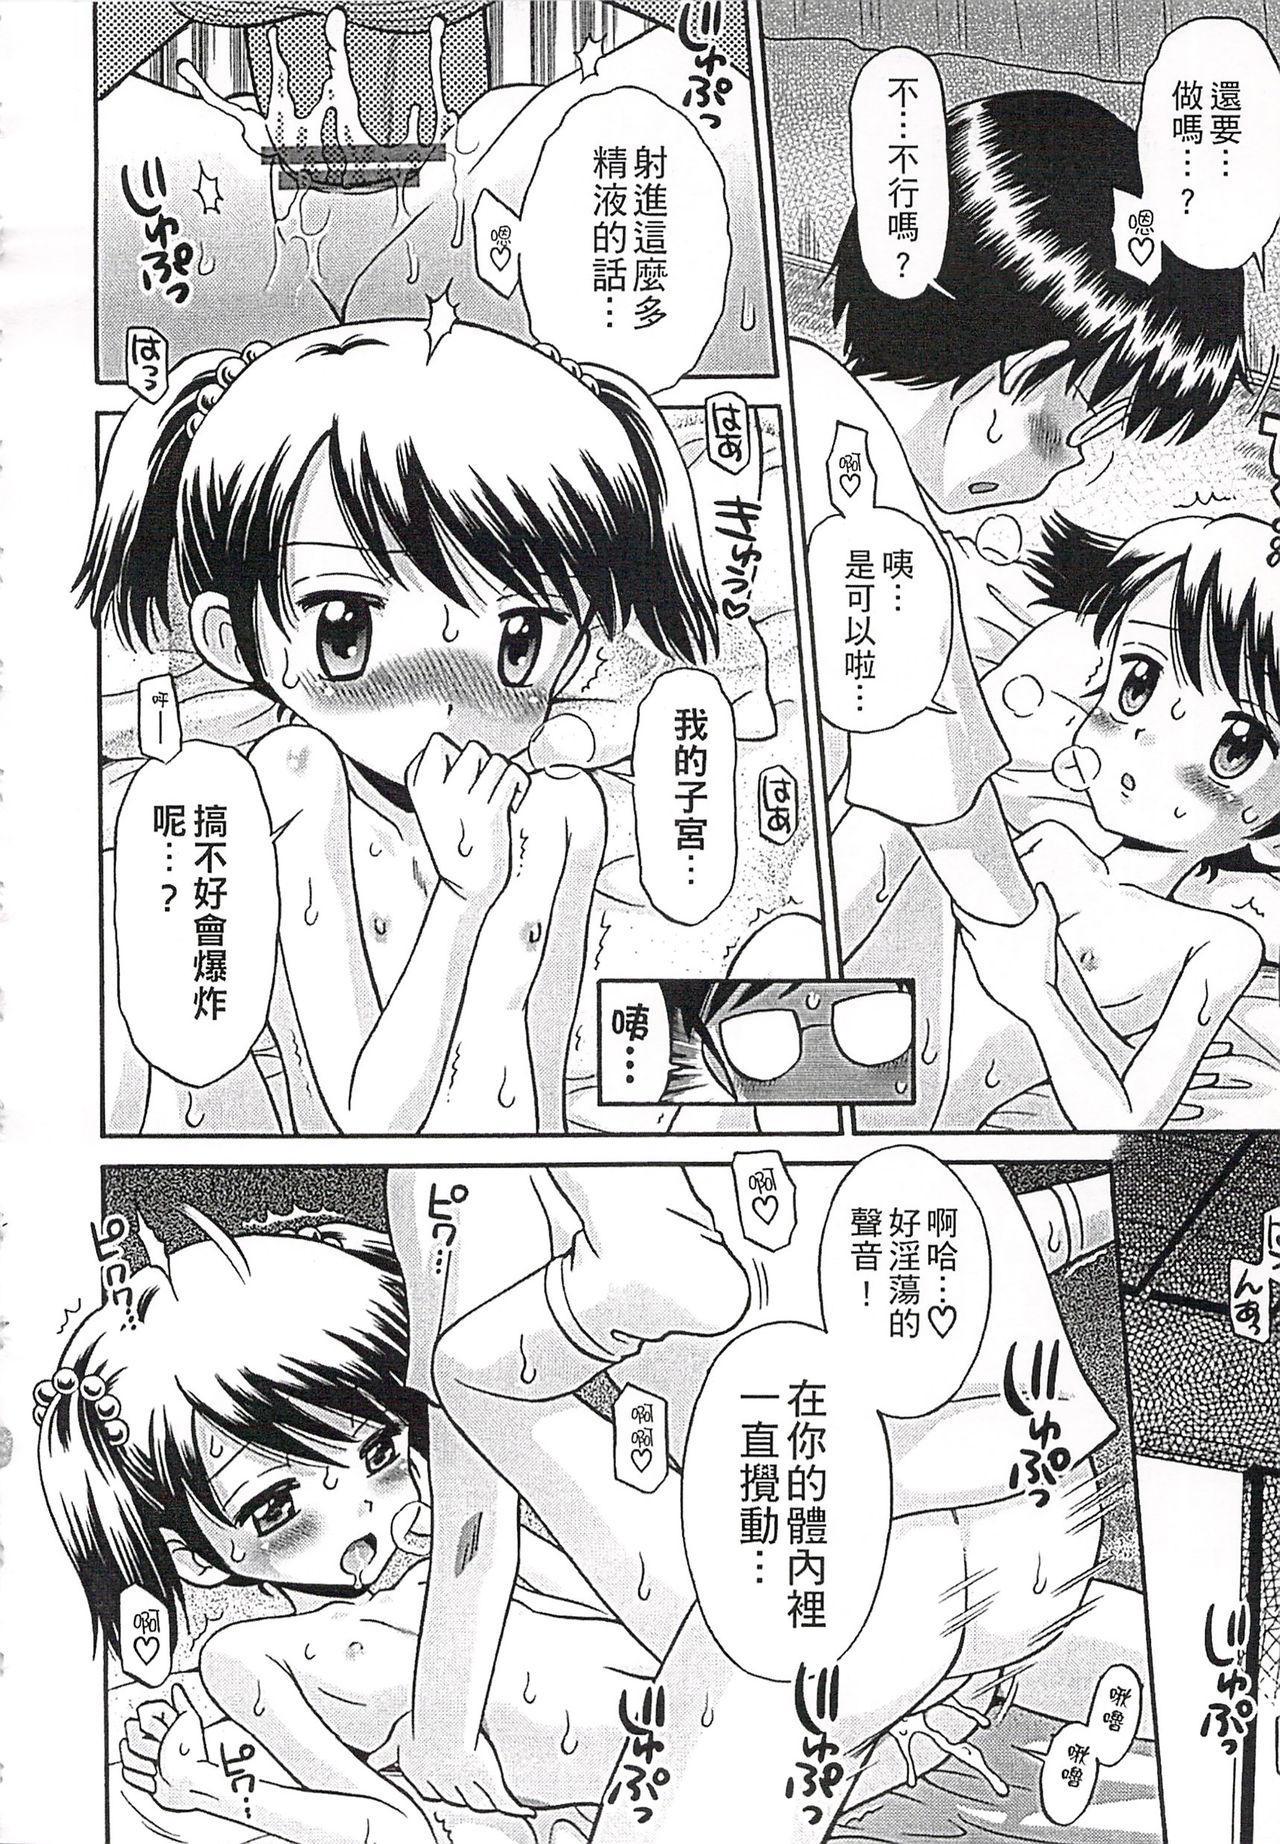 Kore demo Otona Desu Kedo!? Mrs.LOLITA Kanzenban   人家是大人啦! ~Mrs.LOLITA完全版 129